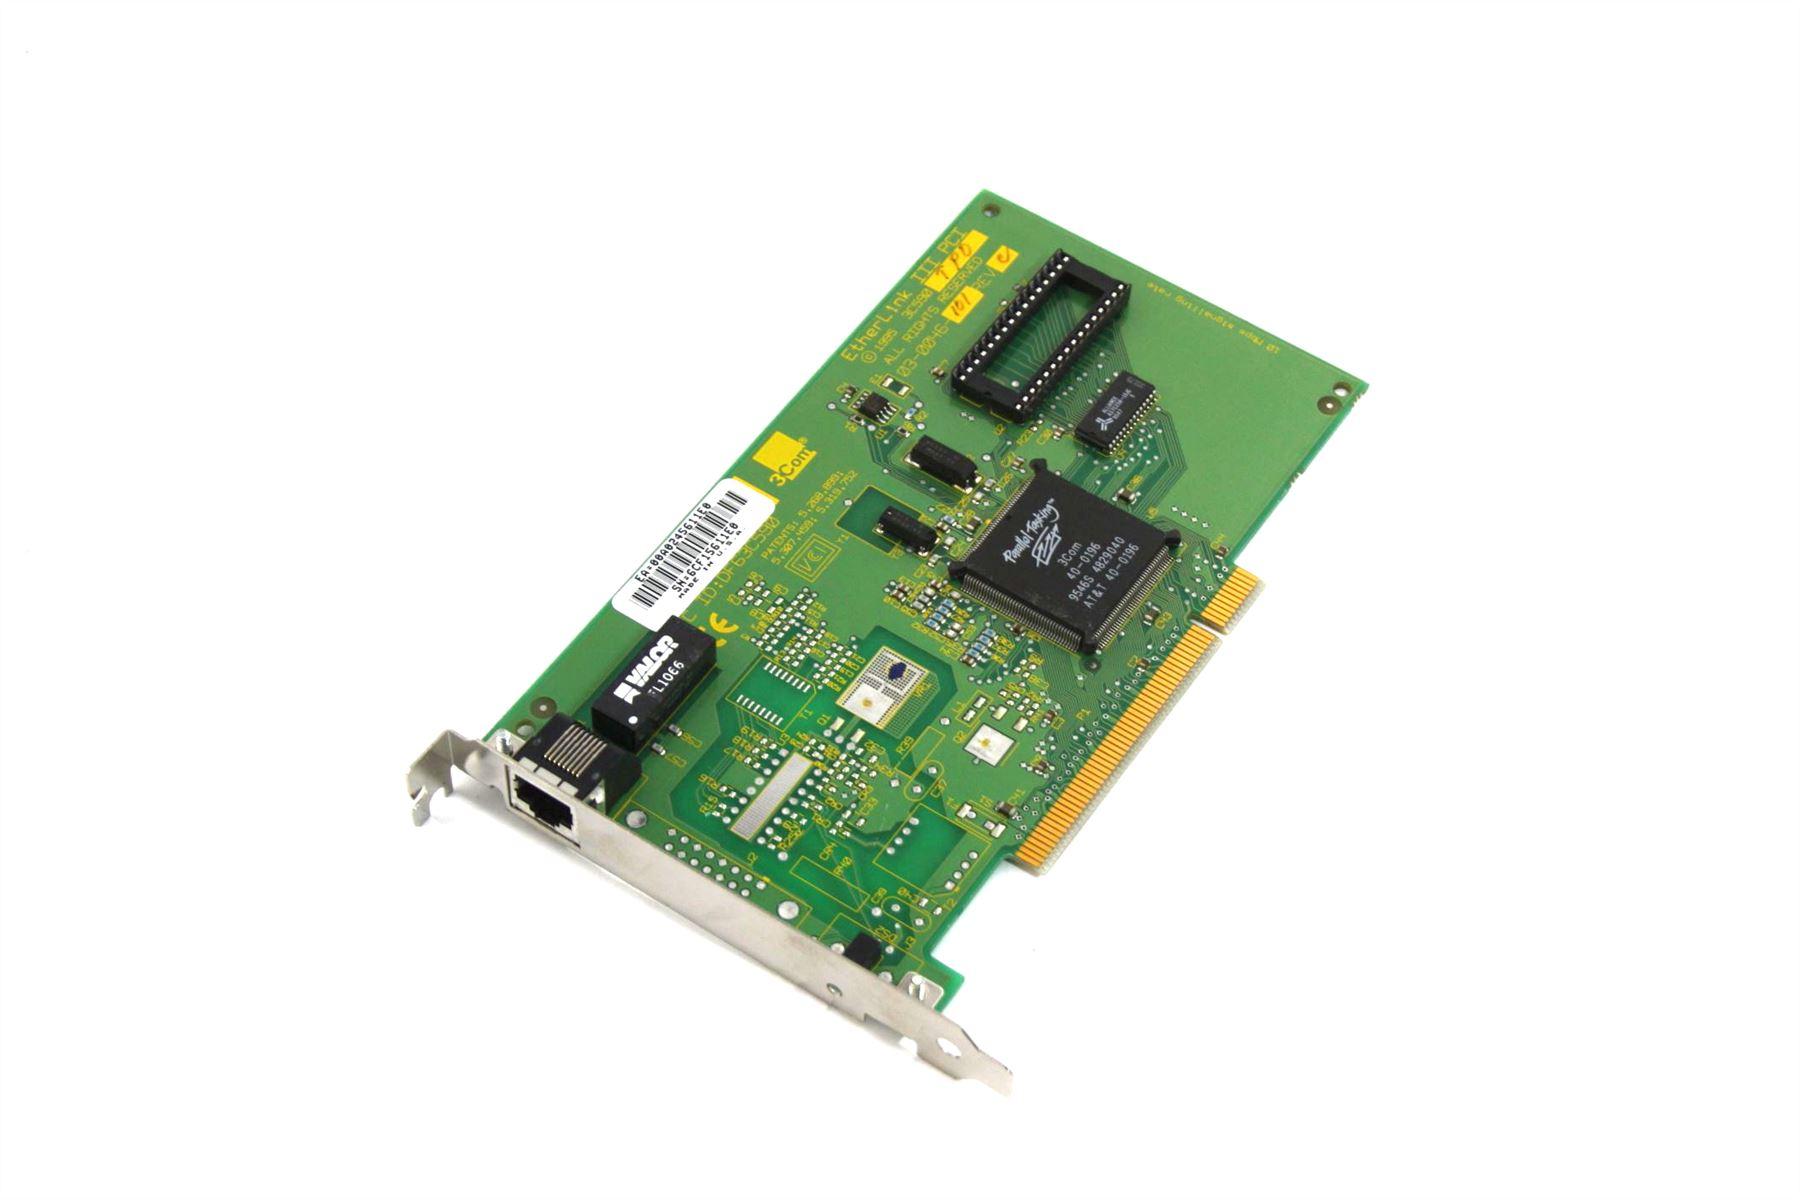 3COM Etherlink III IEthernet Card PCI bus Network Card